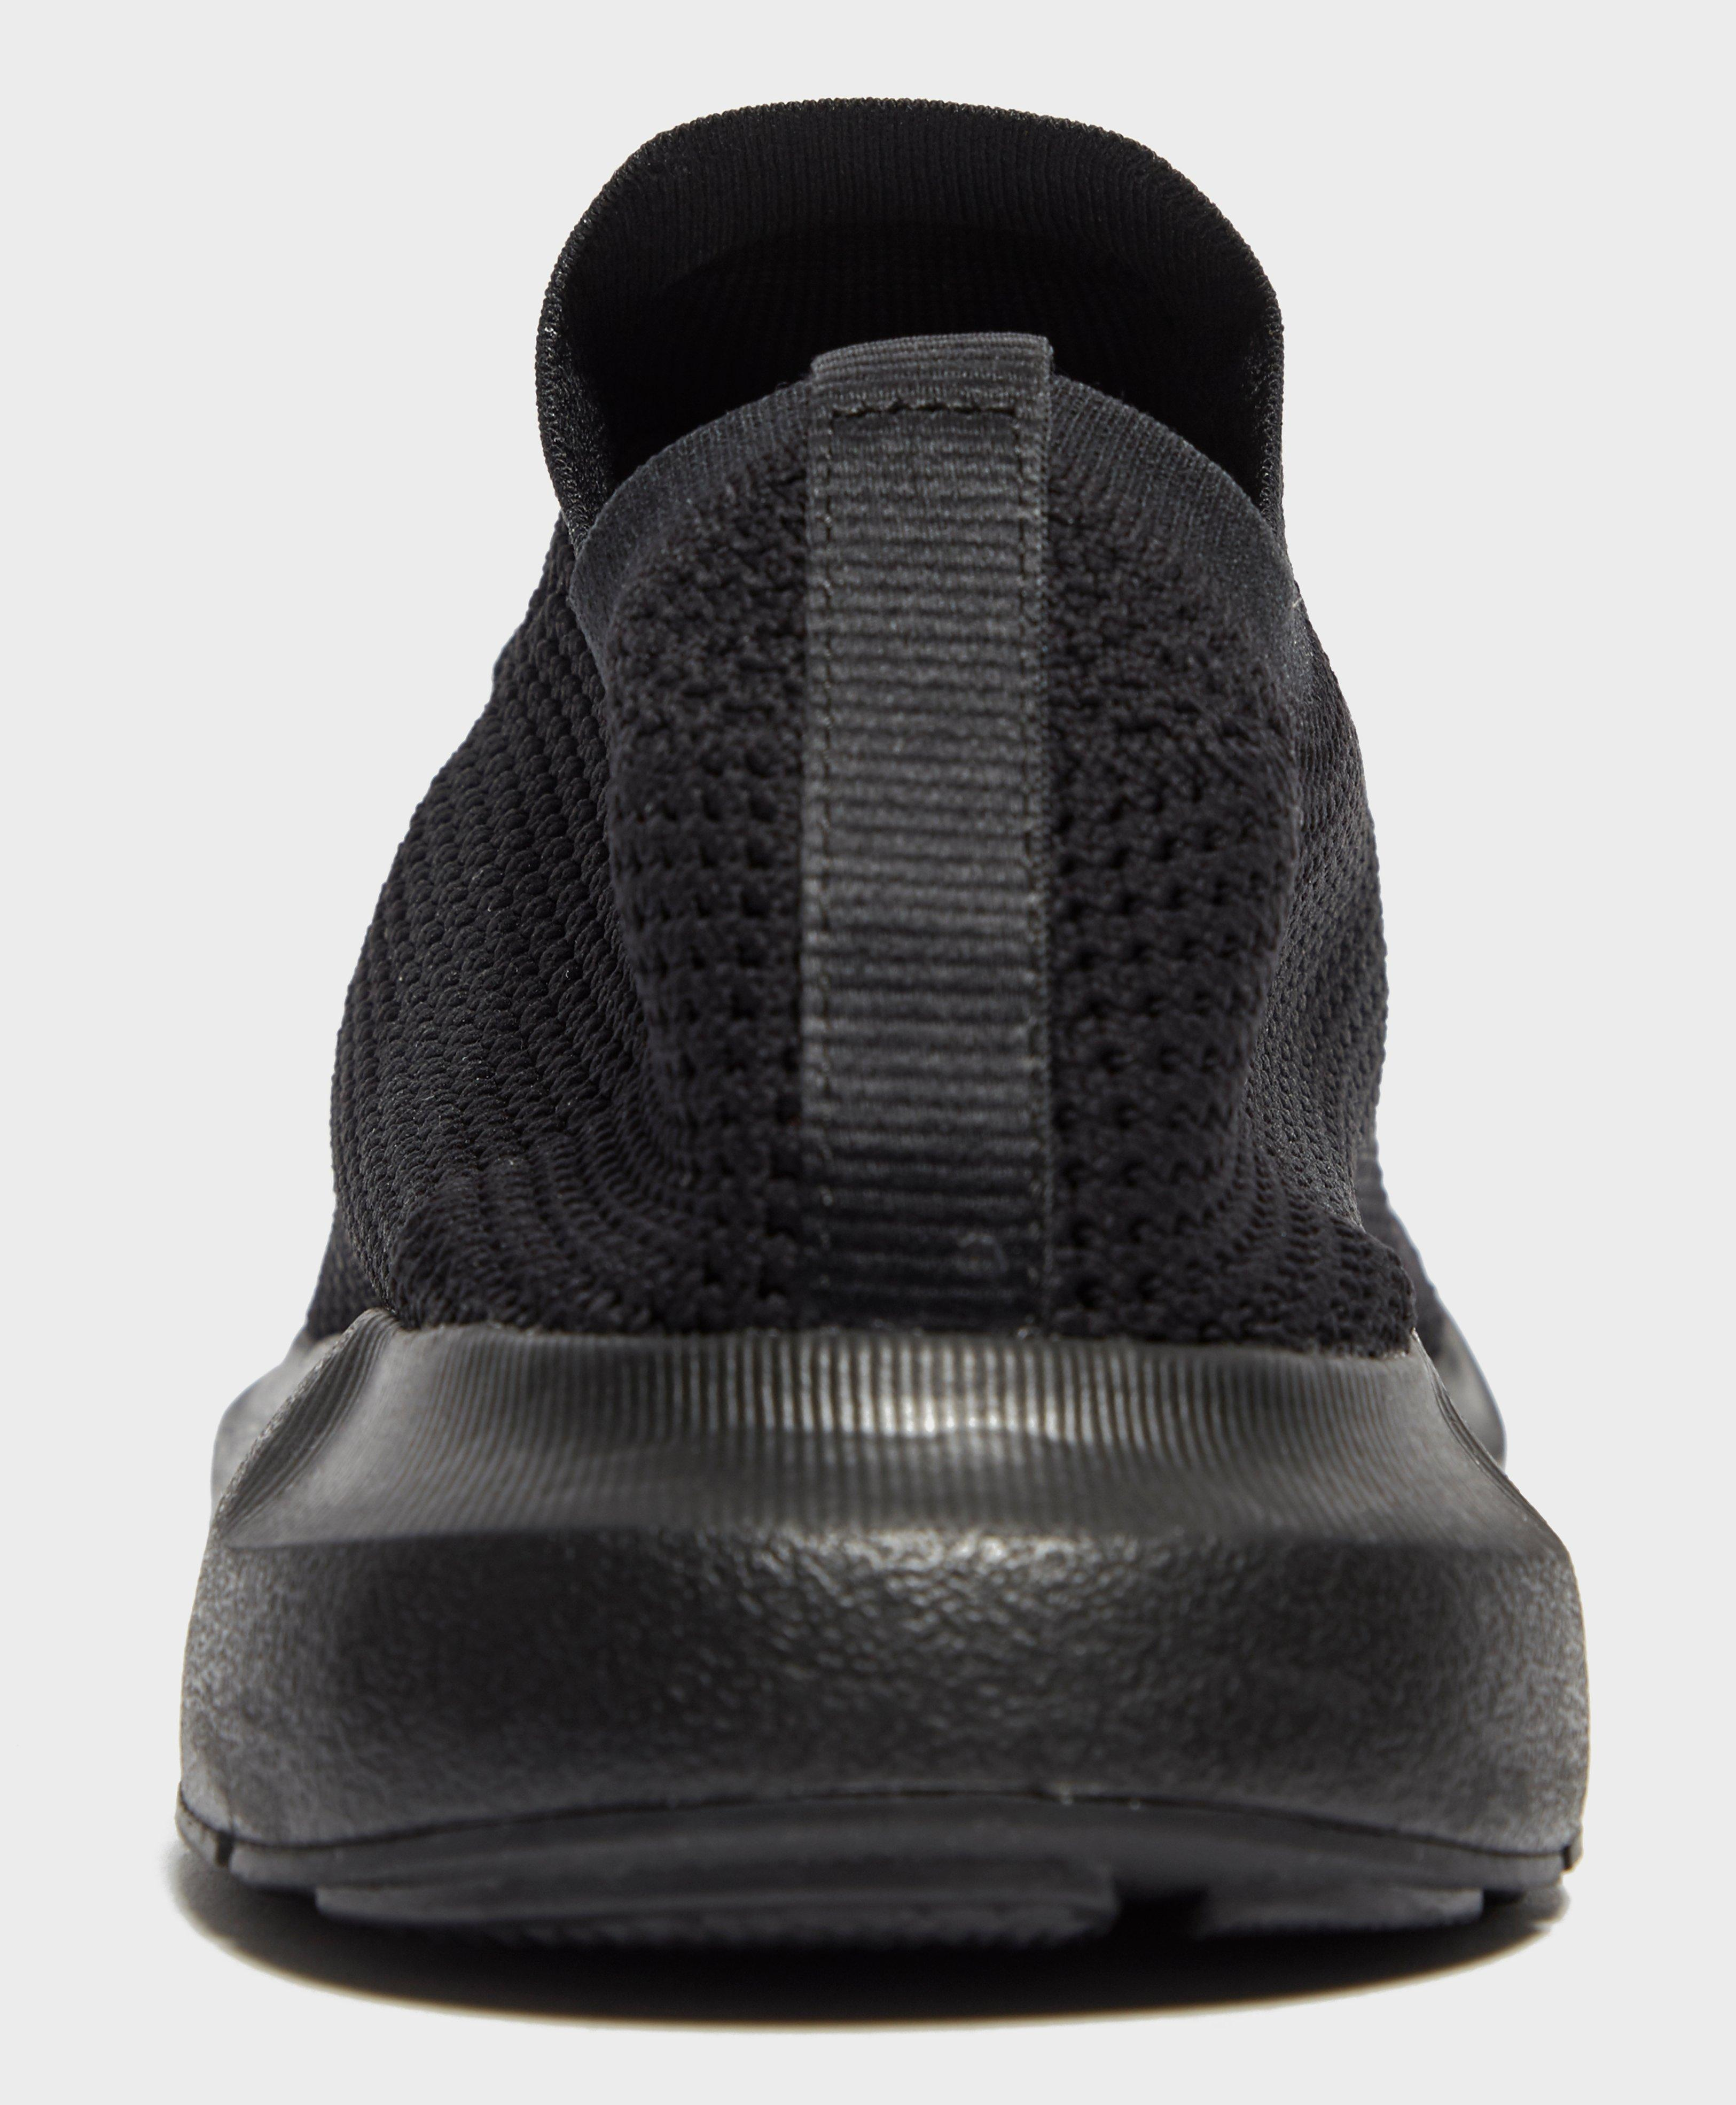 adidas Originals Synthetic Swift Run Pk in Black for Men